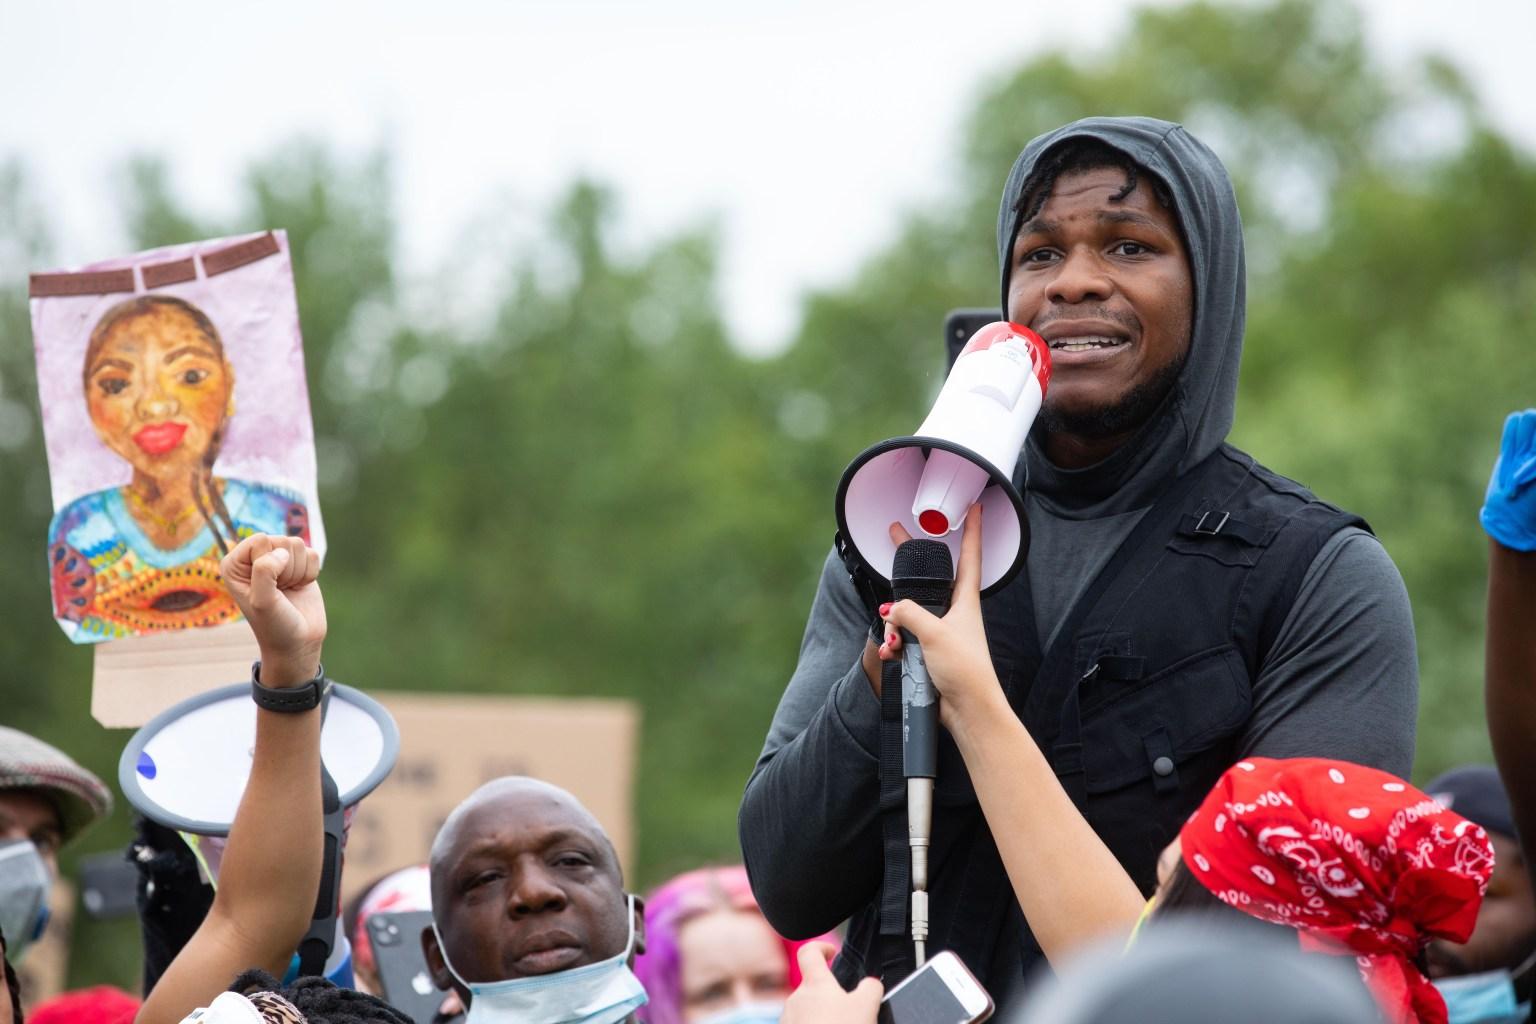 Star Wars actor John Boyega speaks in Hyde Park, London in support of the Black Lives Matter movement  David Parry/Shutterstock